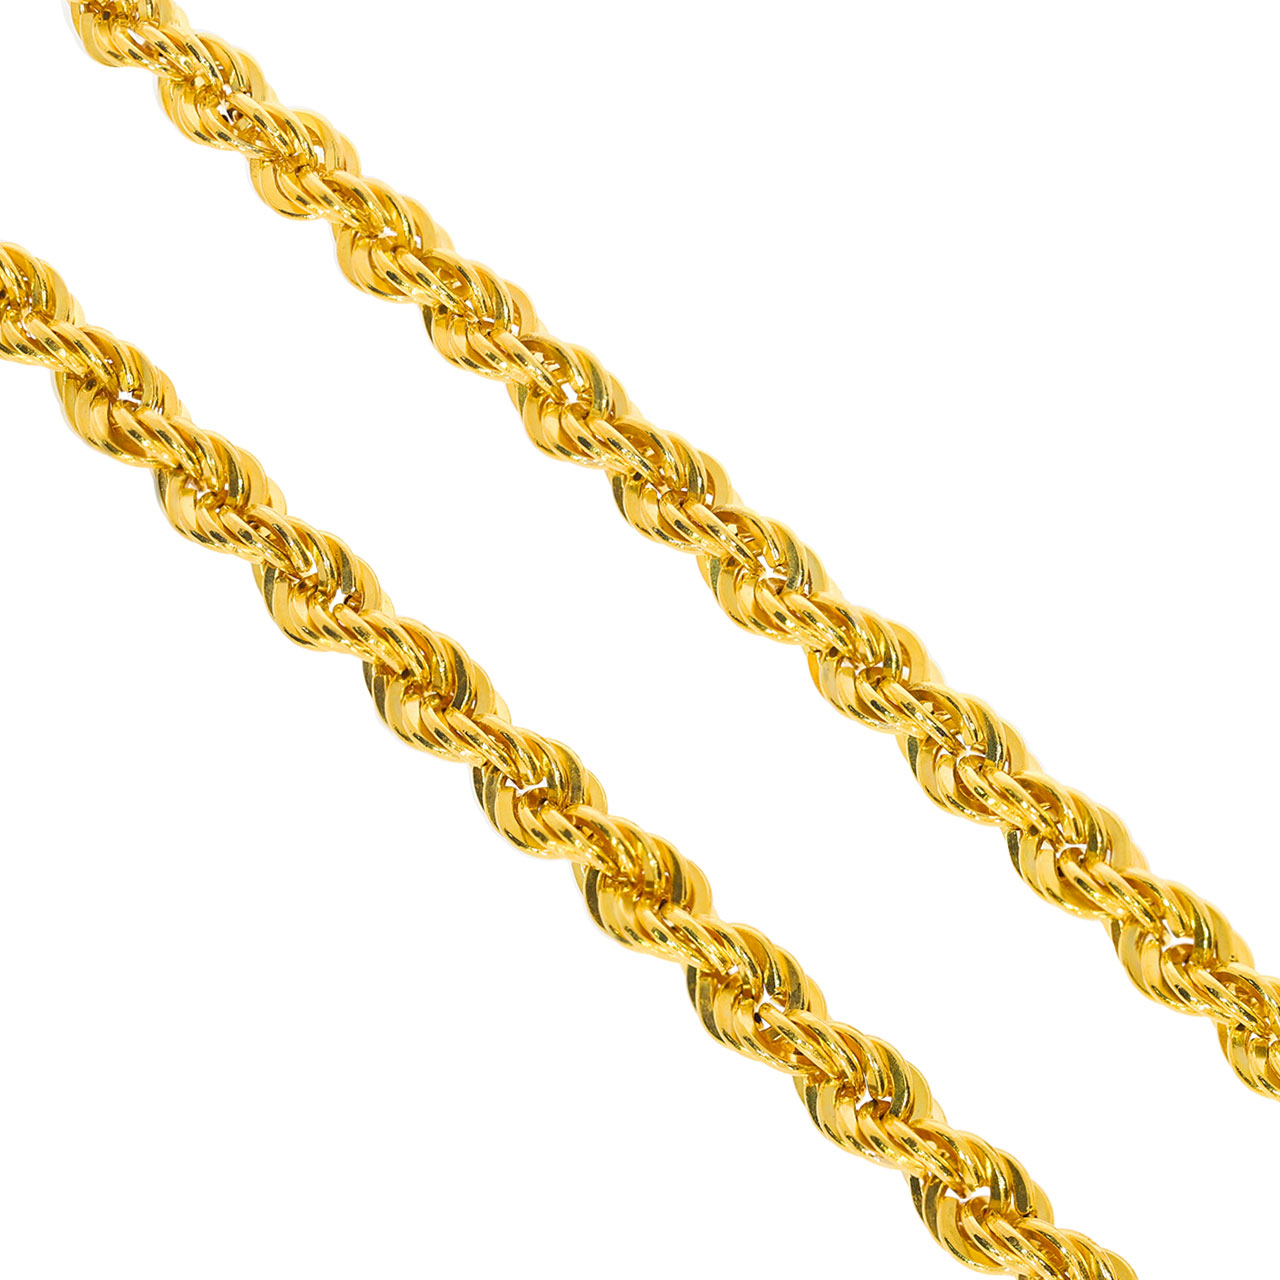 5,2mm Halat Altın Zincir 14 Ayar